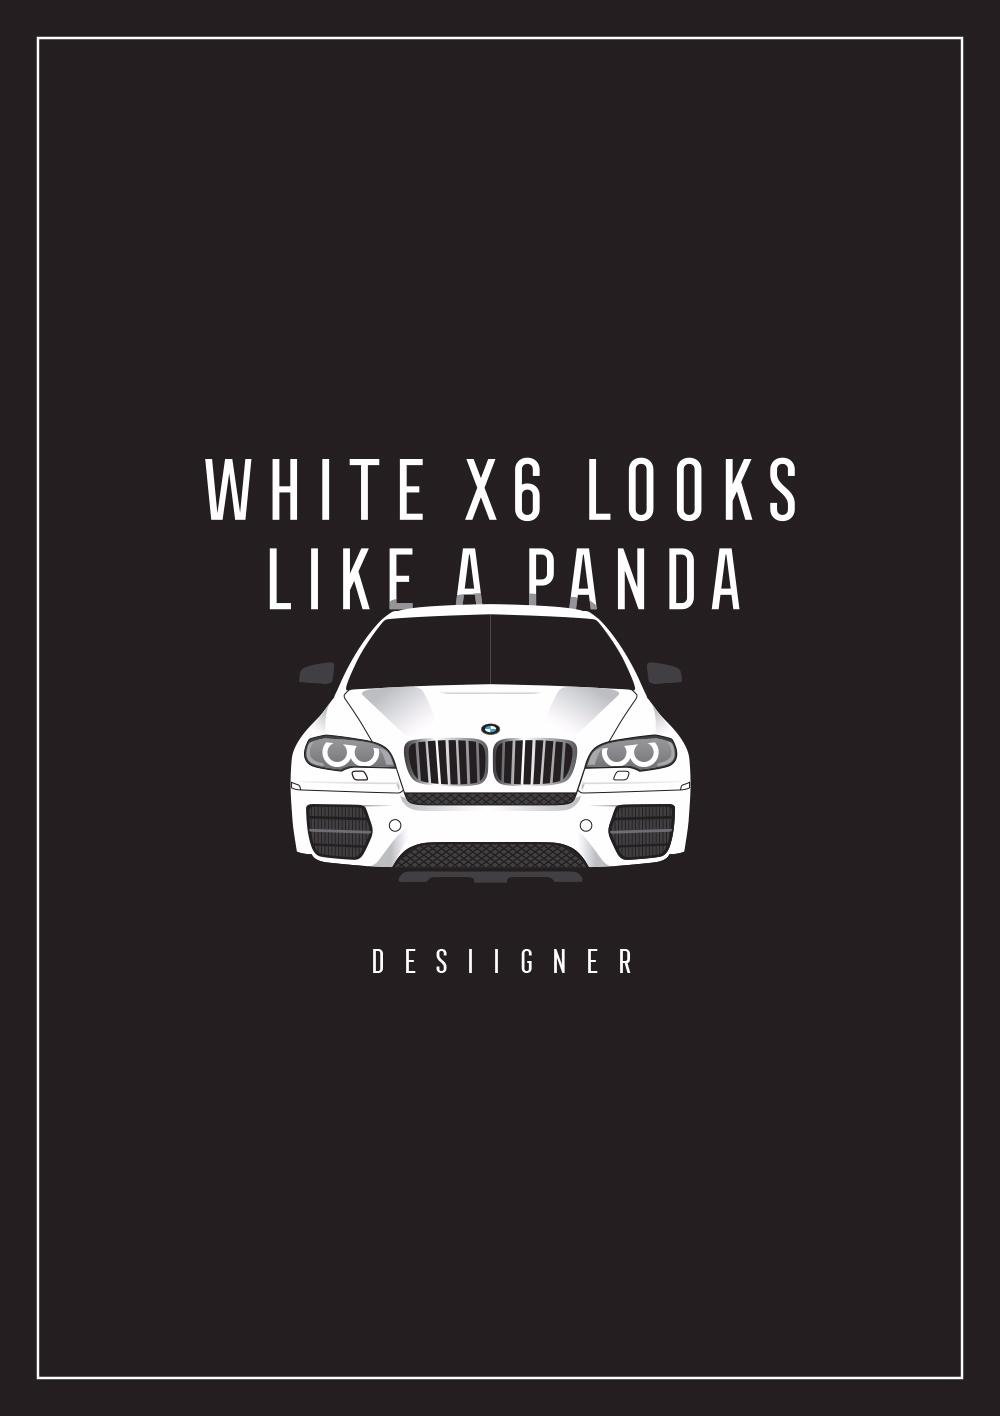 Desiigner - Panda - illustration - federicogastaldi | ello